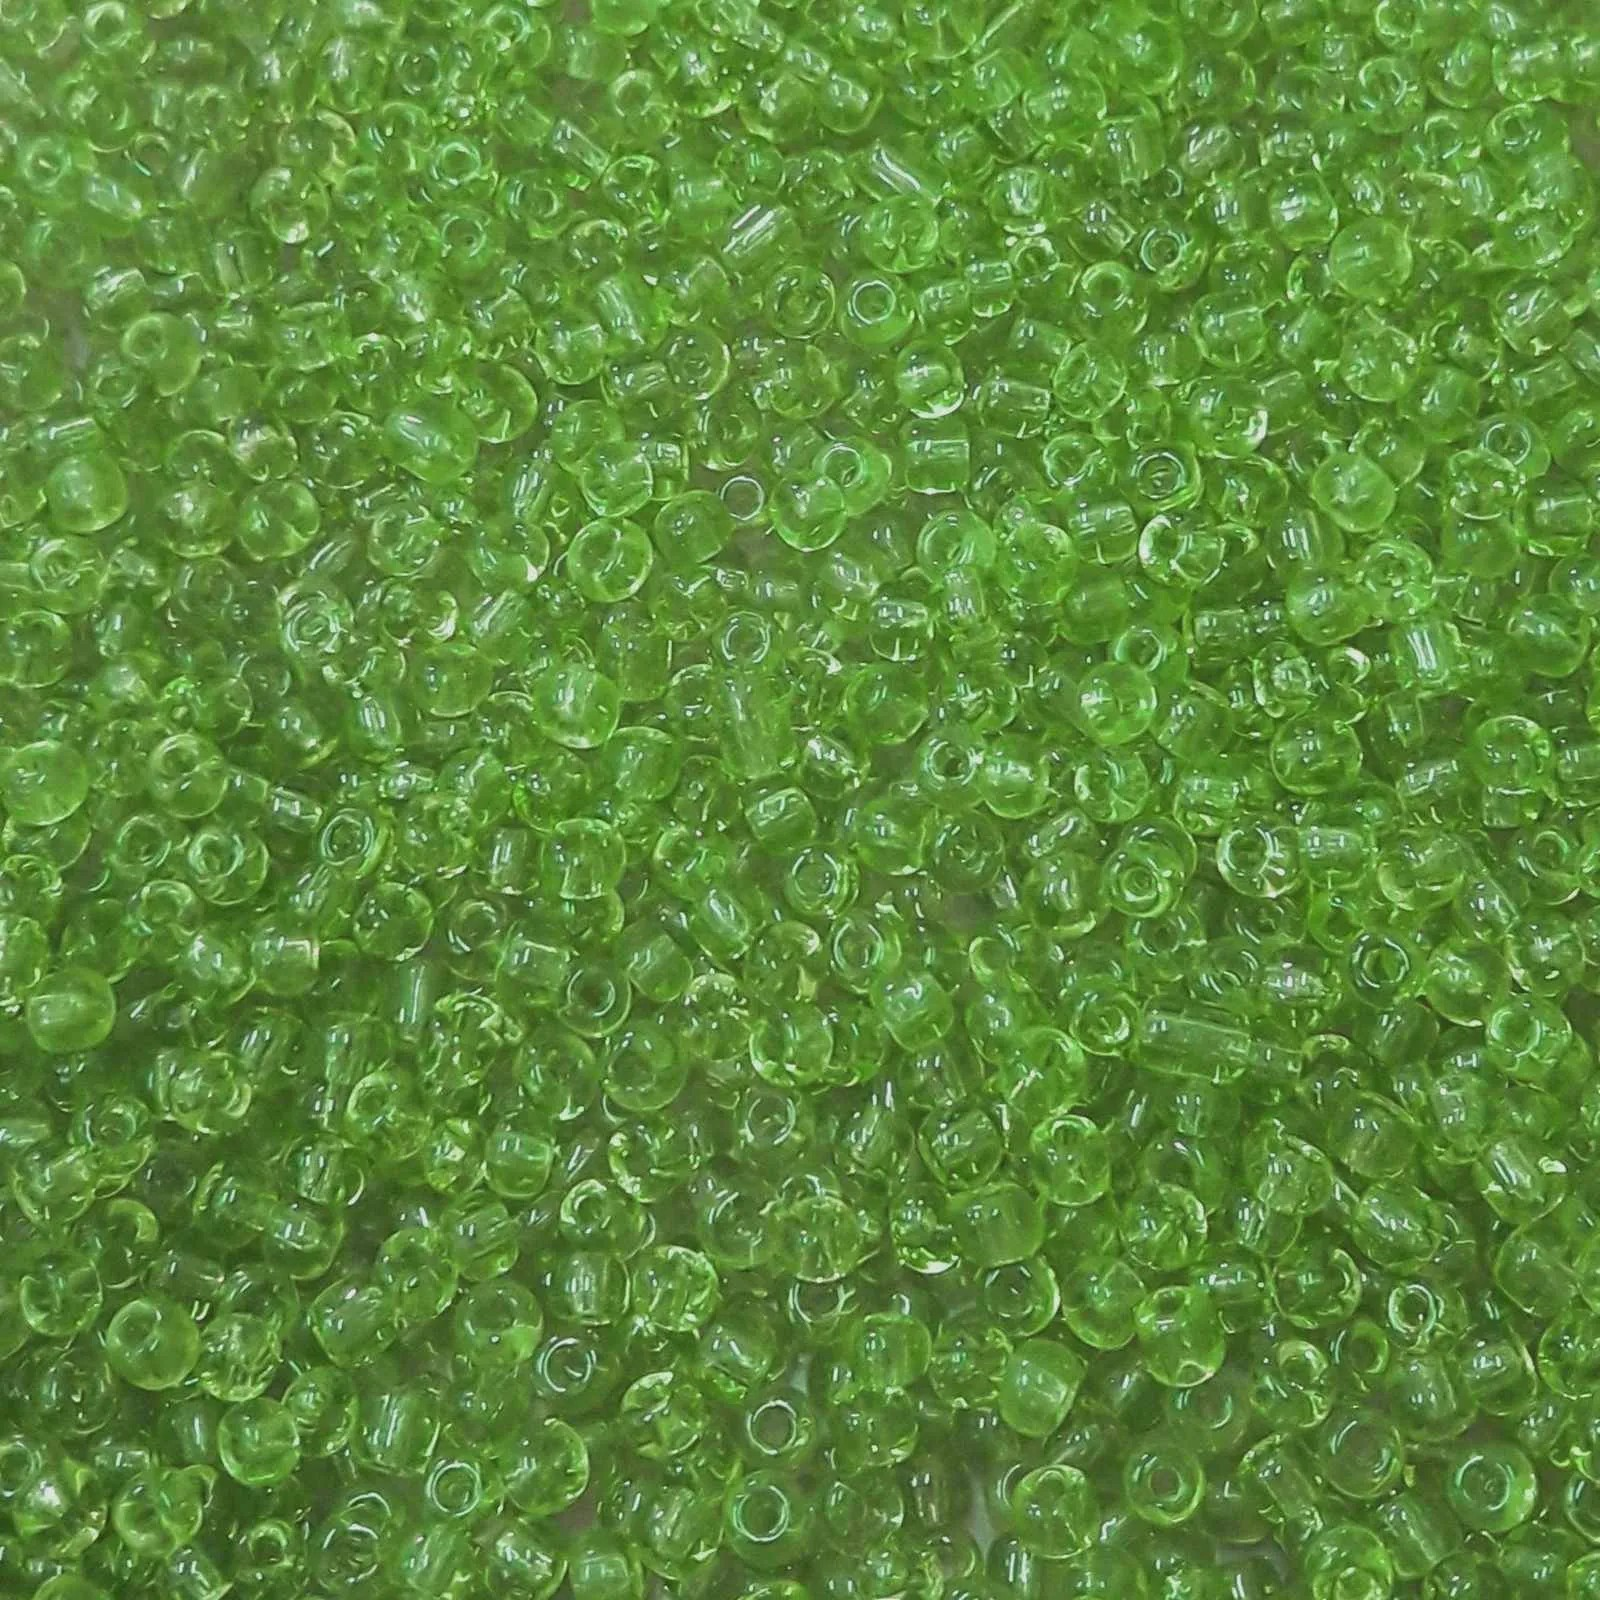 Miçanga 6/0 Transparente -  500gr